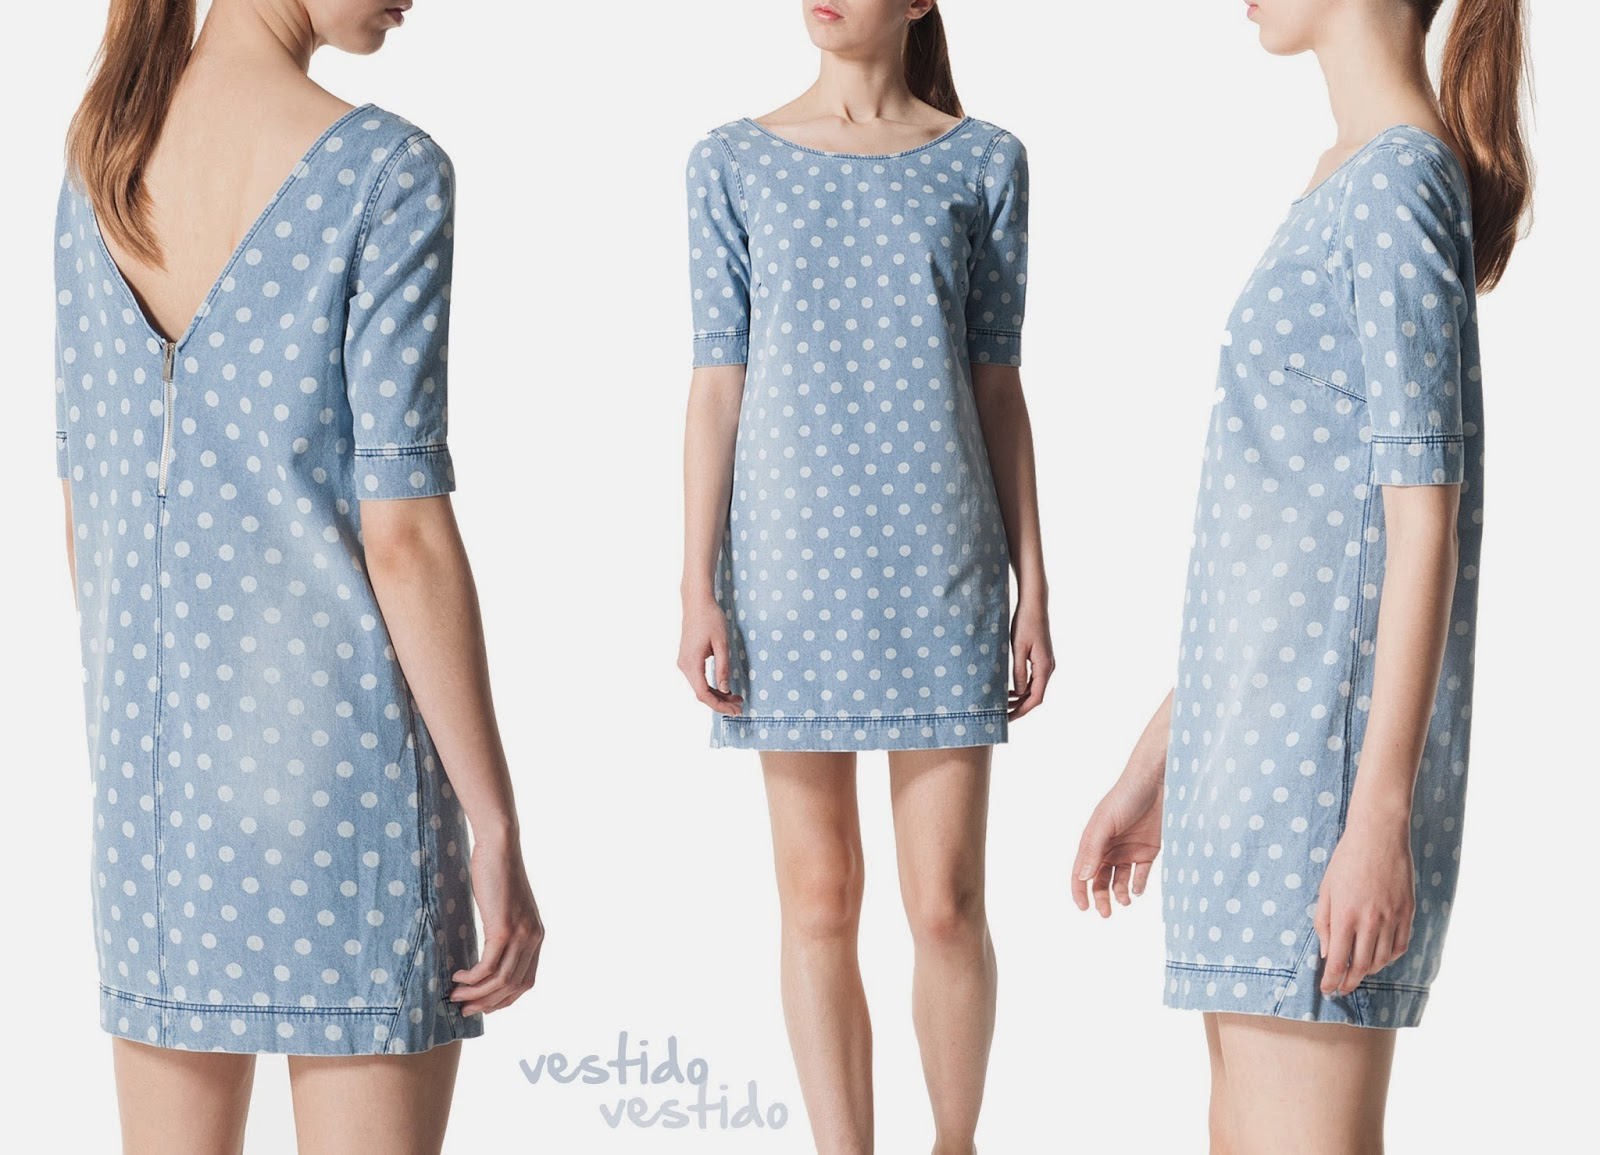 photo-stradivarius-nueva-web-vestido-denim-lunares